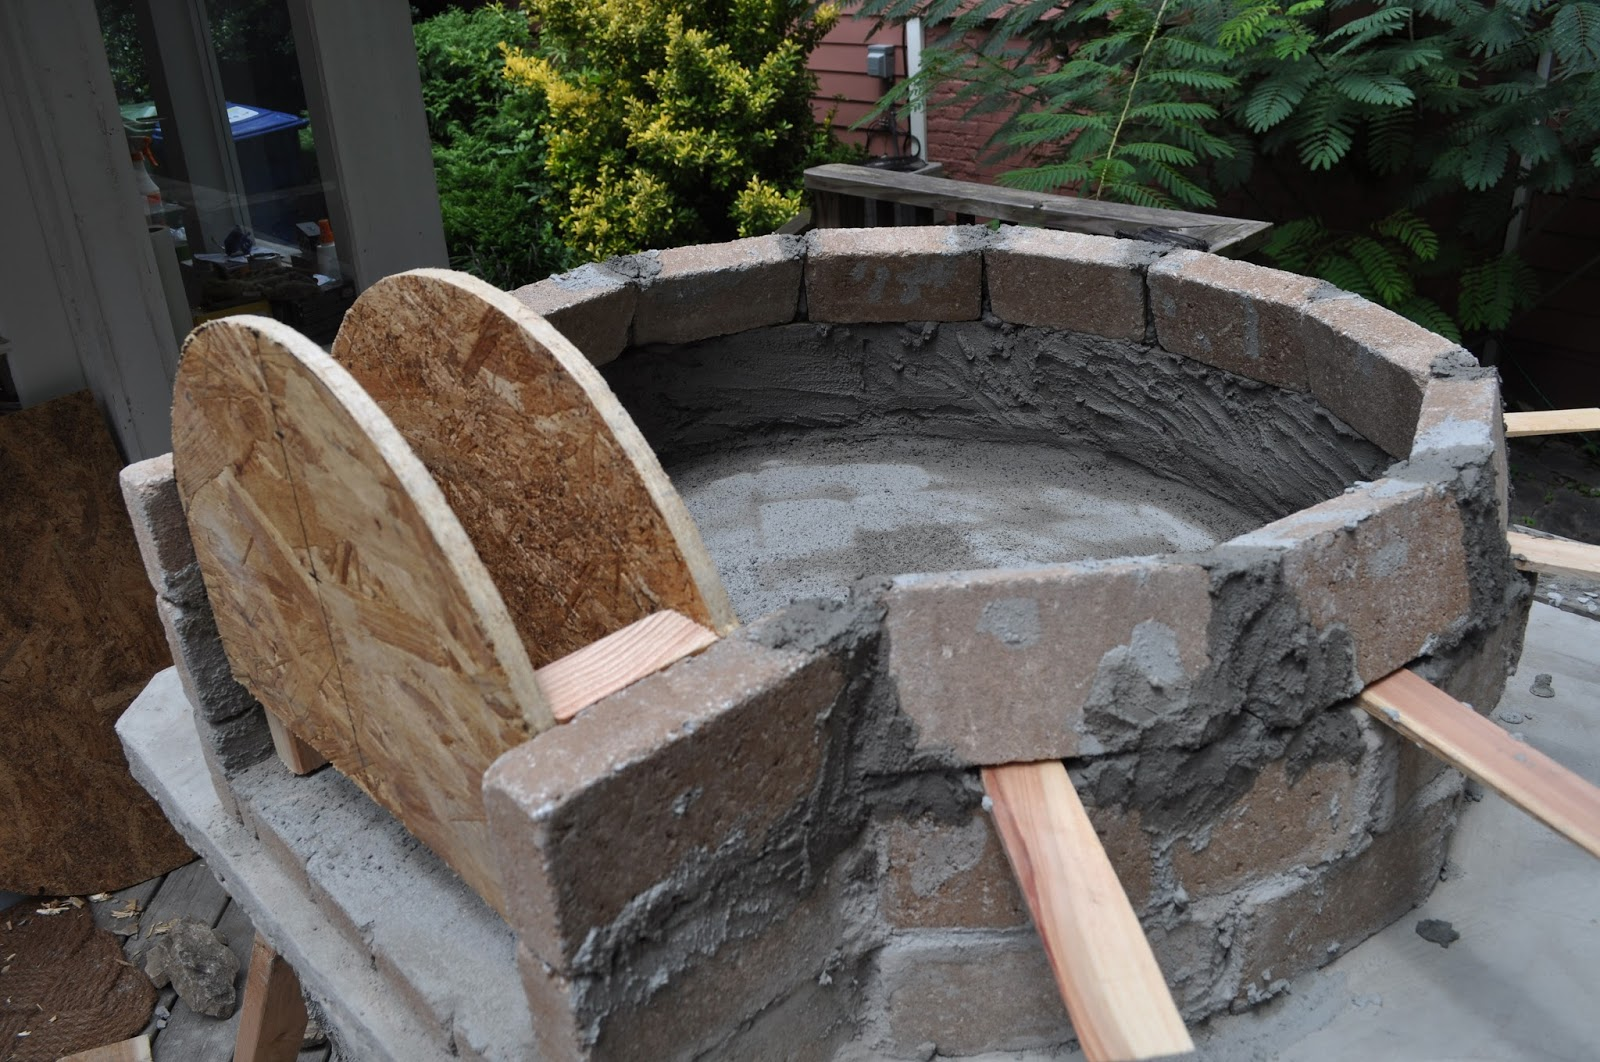 Heat Resistant Mortar Lowe S : The cow spot outdoor kitchen finale